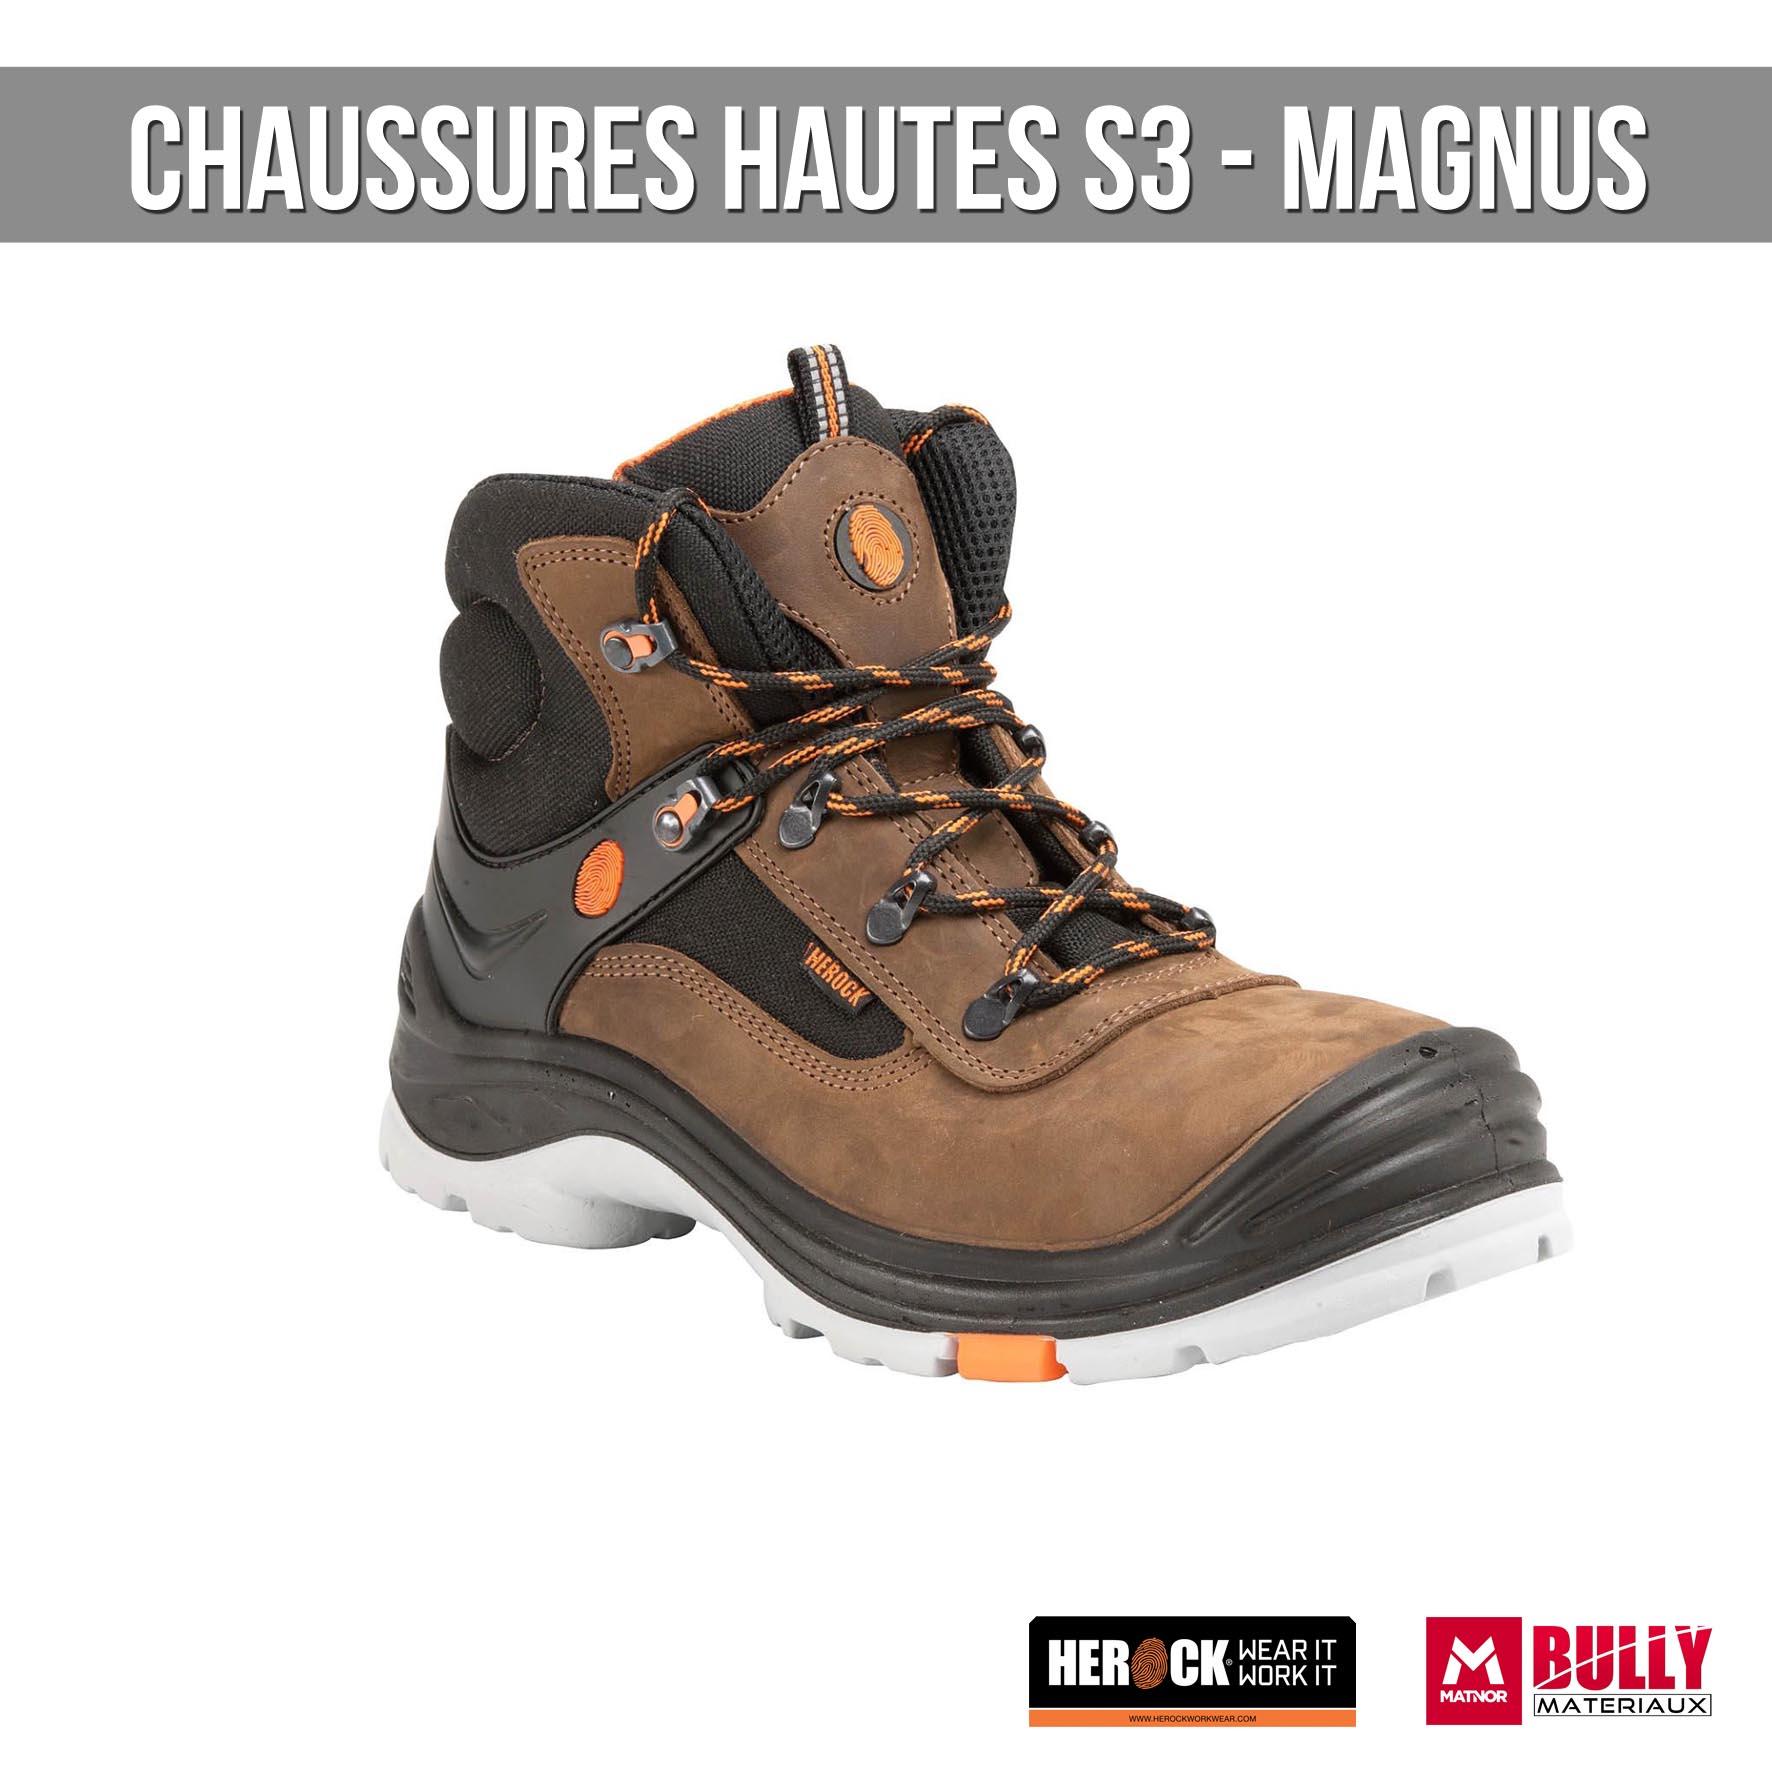 Chaussure magnus